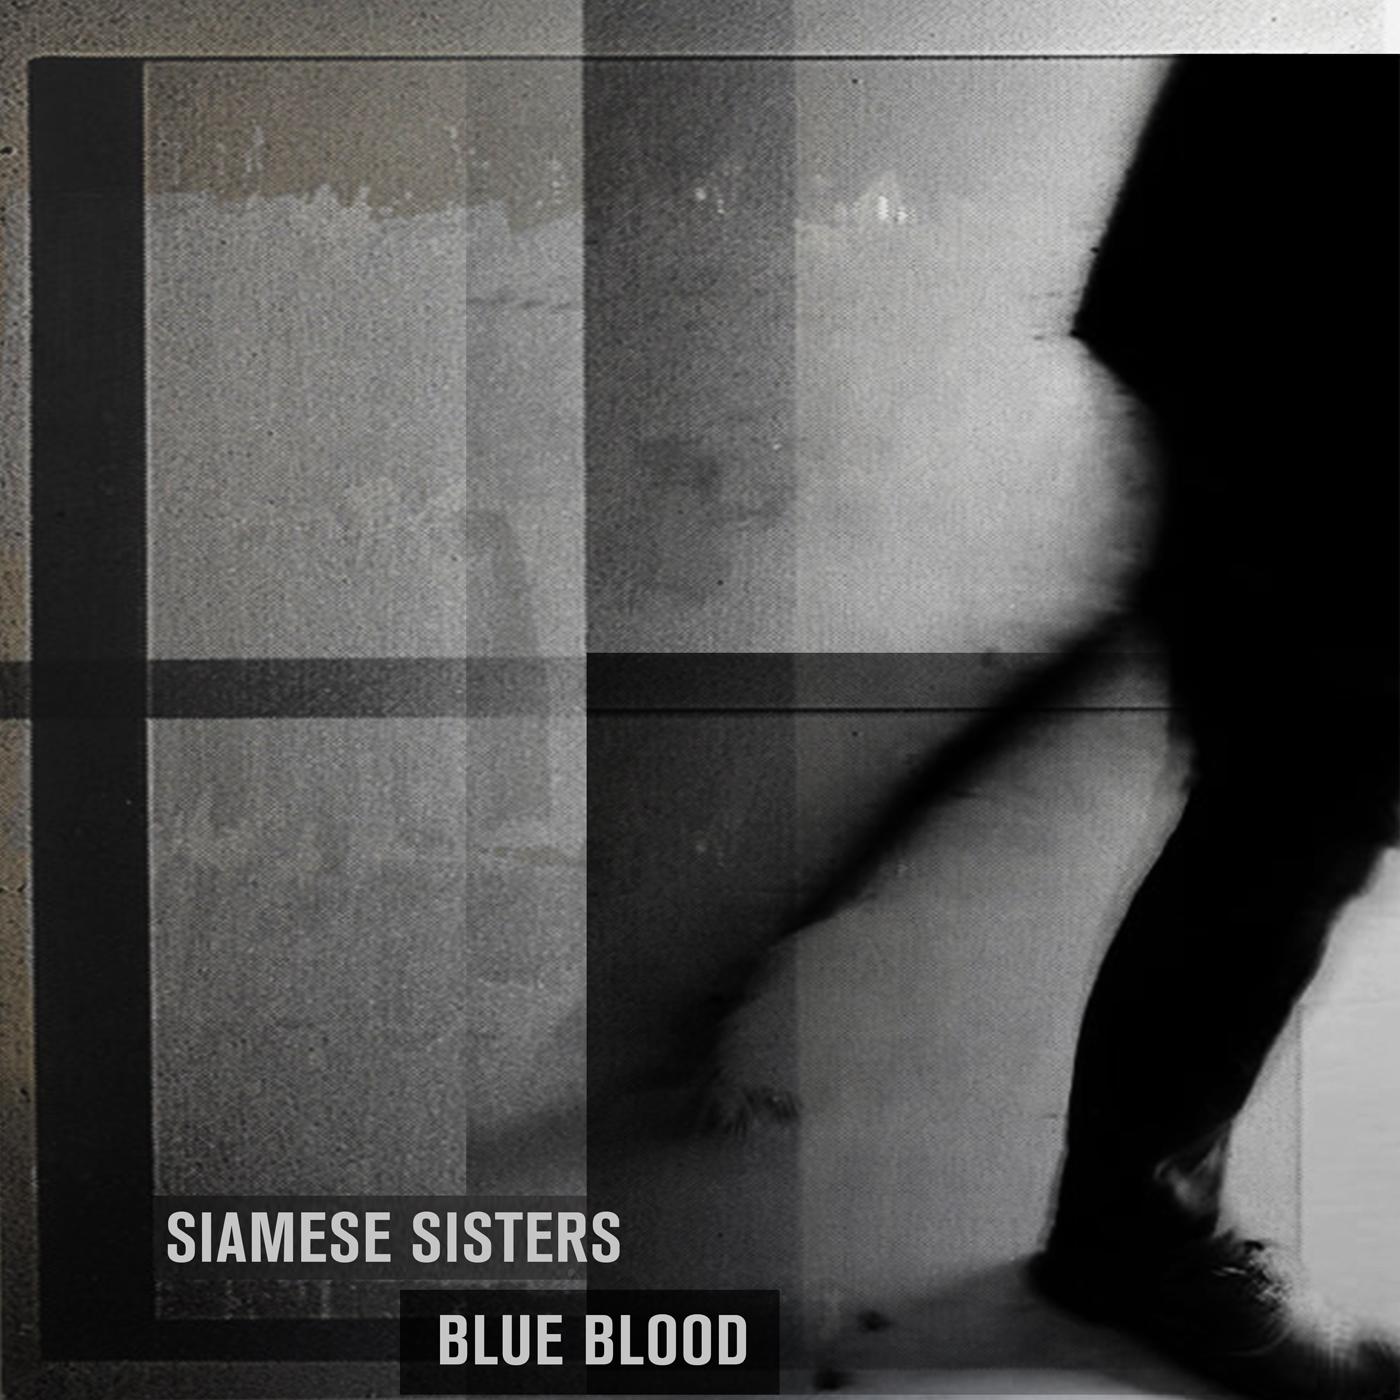 SIAMESE SISTERS - BLUE BLOOD